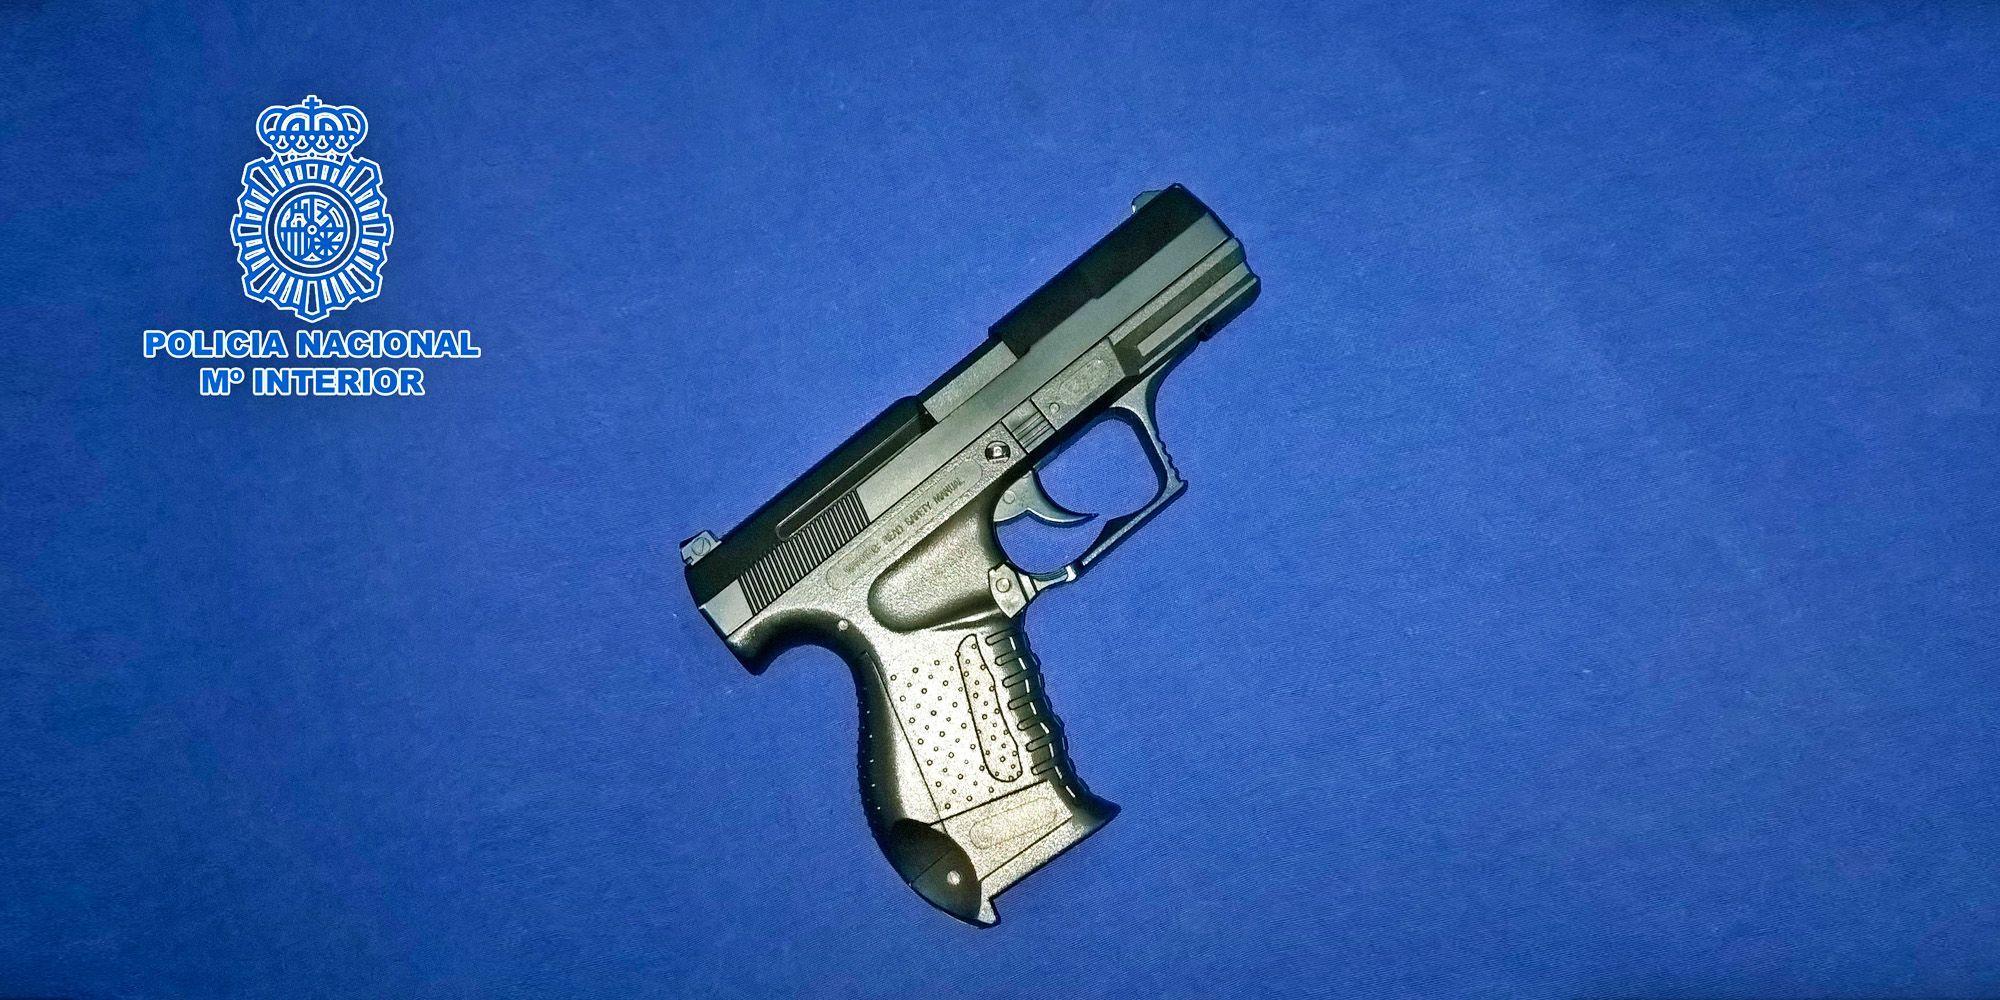 pistola-cnp